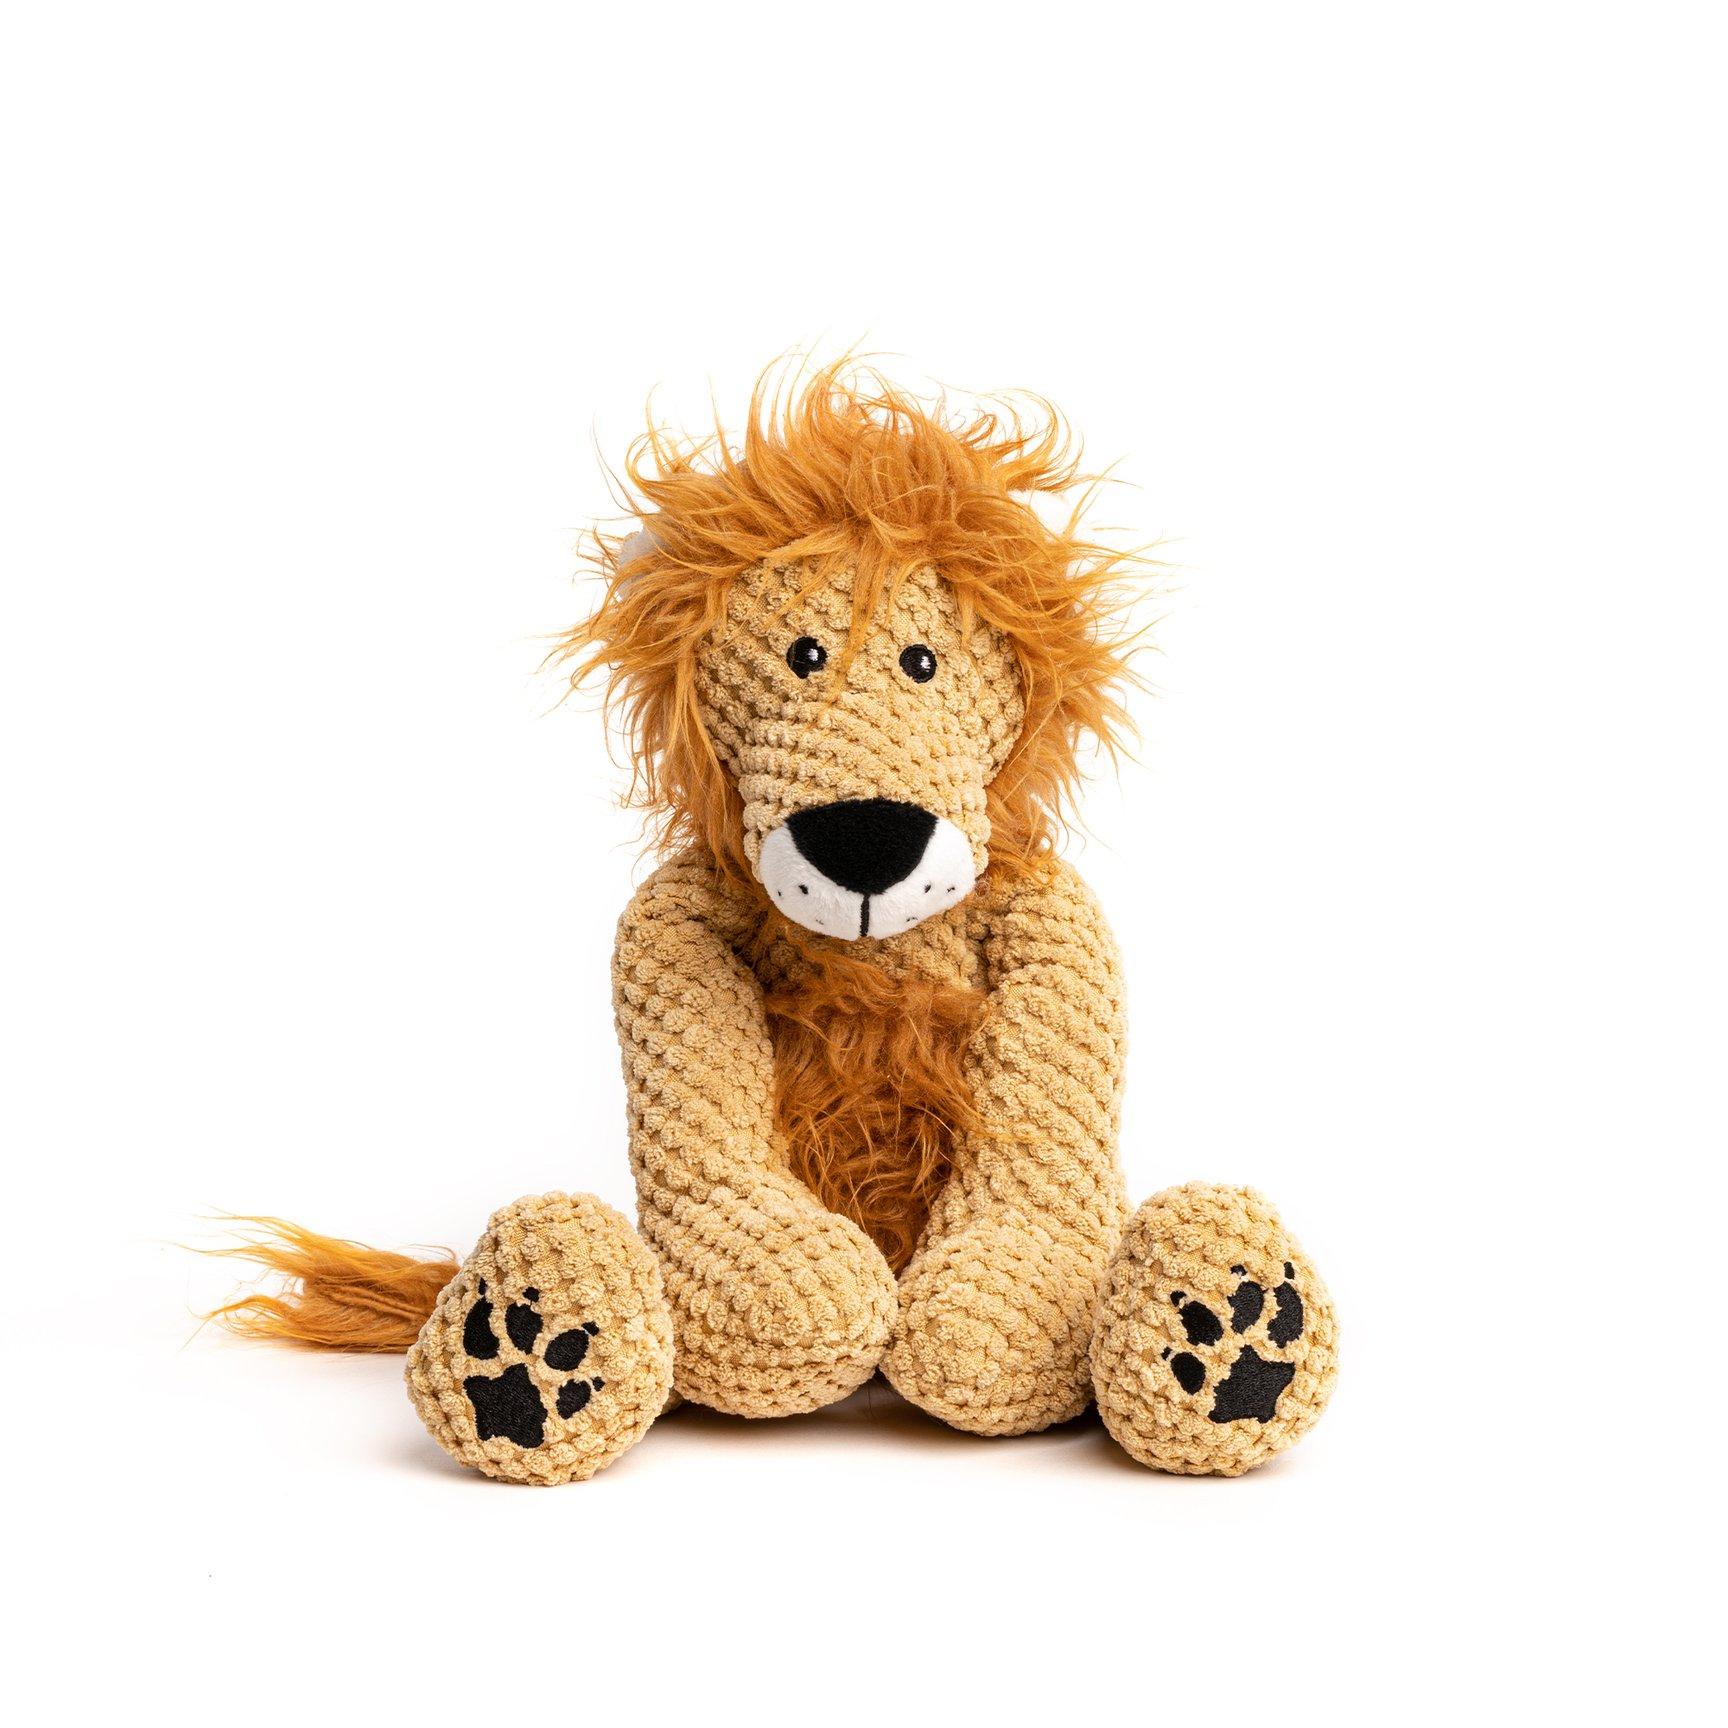 fabdog Floppy Plush Dog Toy, Lion, Small